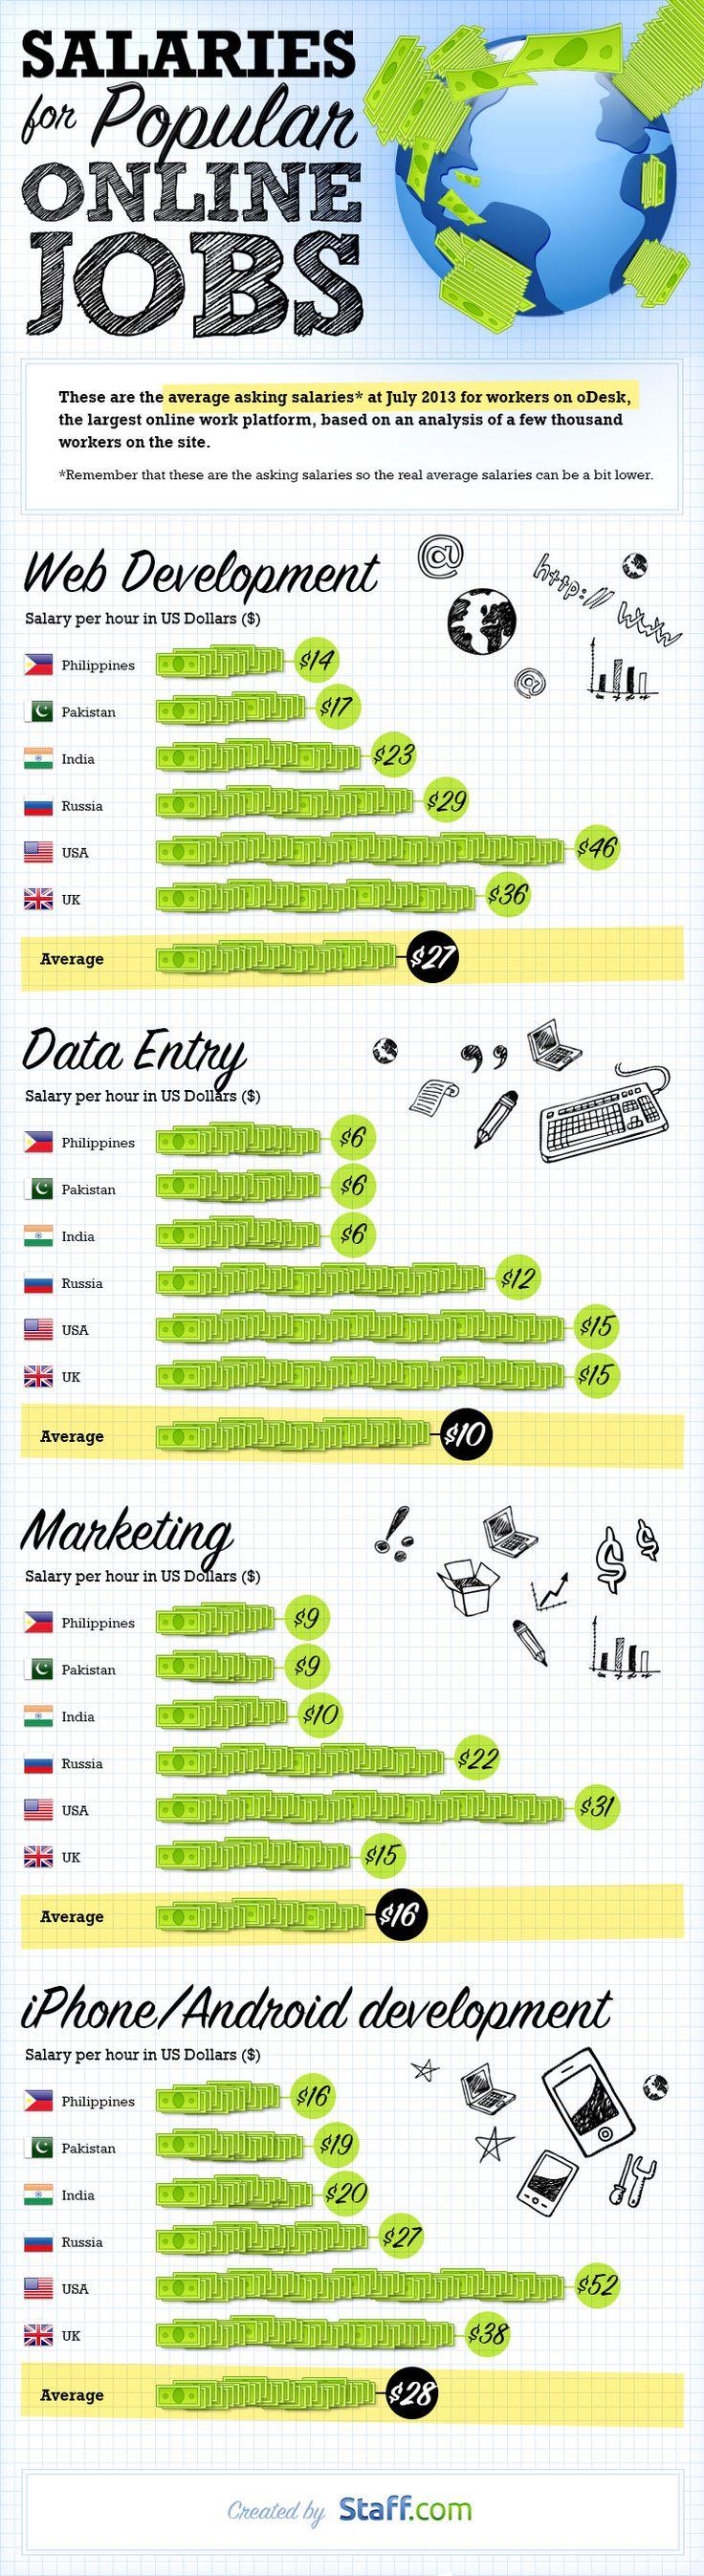 salaries-for-popular-online-jobs--infographic_521629414c083.png (750×2746)